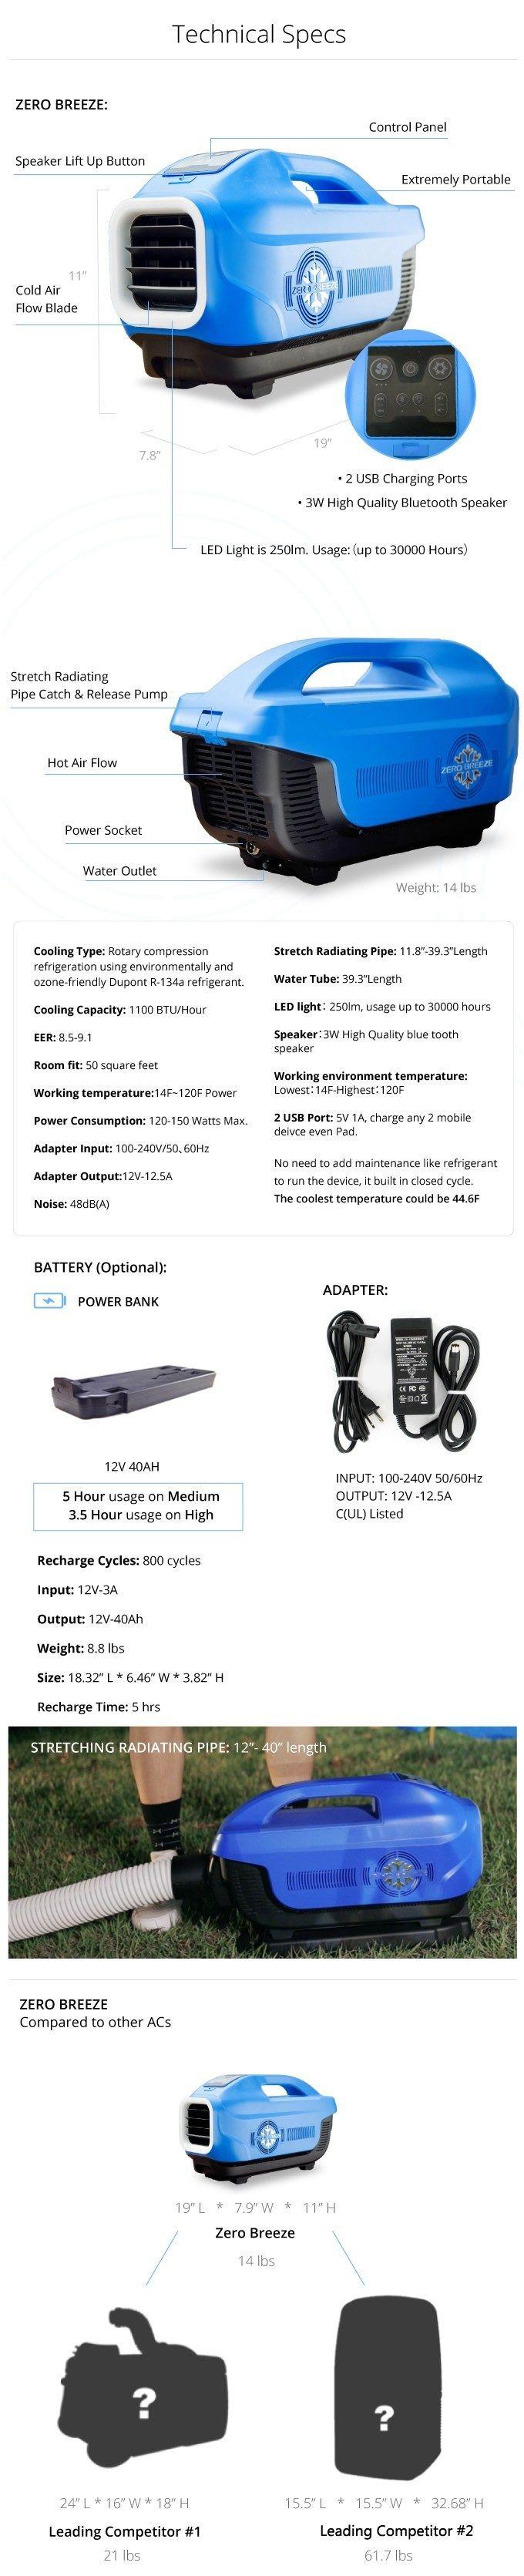 12v portable air conditioner specs